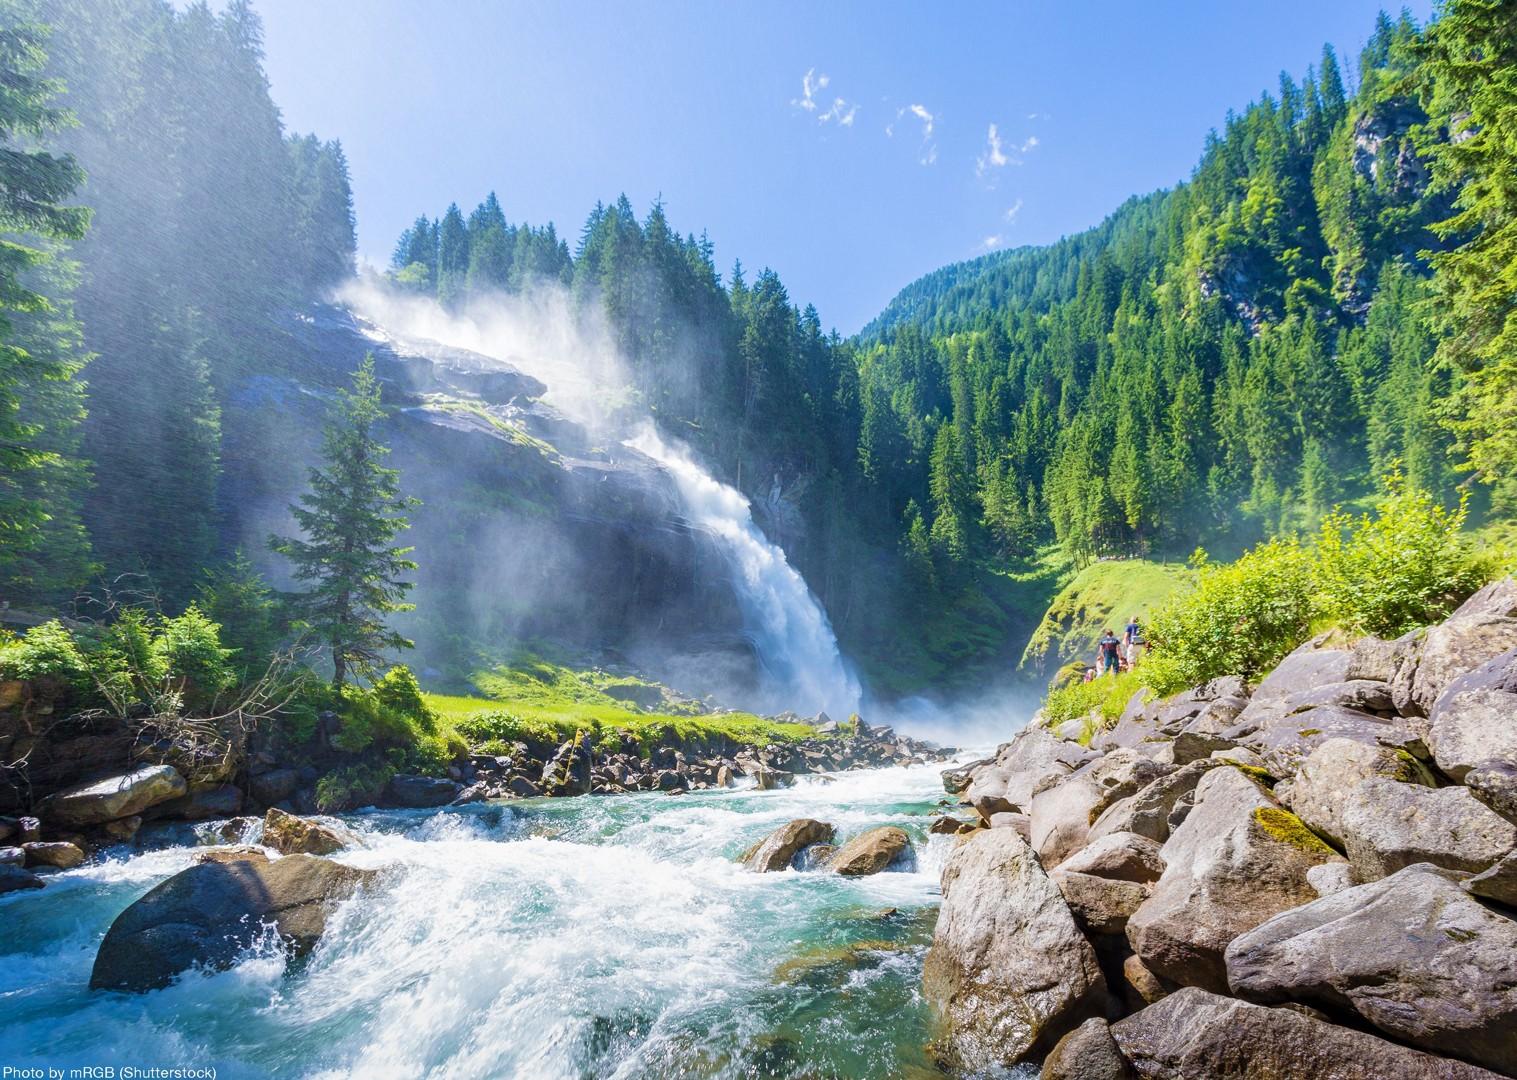 waterfalls-of-austria-krimml-highest-cycling-tour.jpg - Austria - Tauern Valleys - Self-Guided Leisure Cycling Holiday - Leisure Cycling